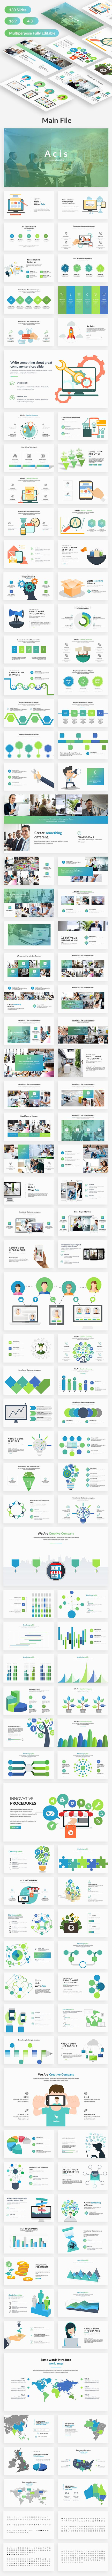 Acis Business Premium Google Slide Template - Google Slides Presentation Templates